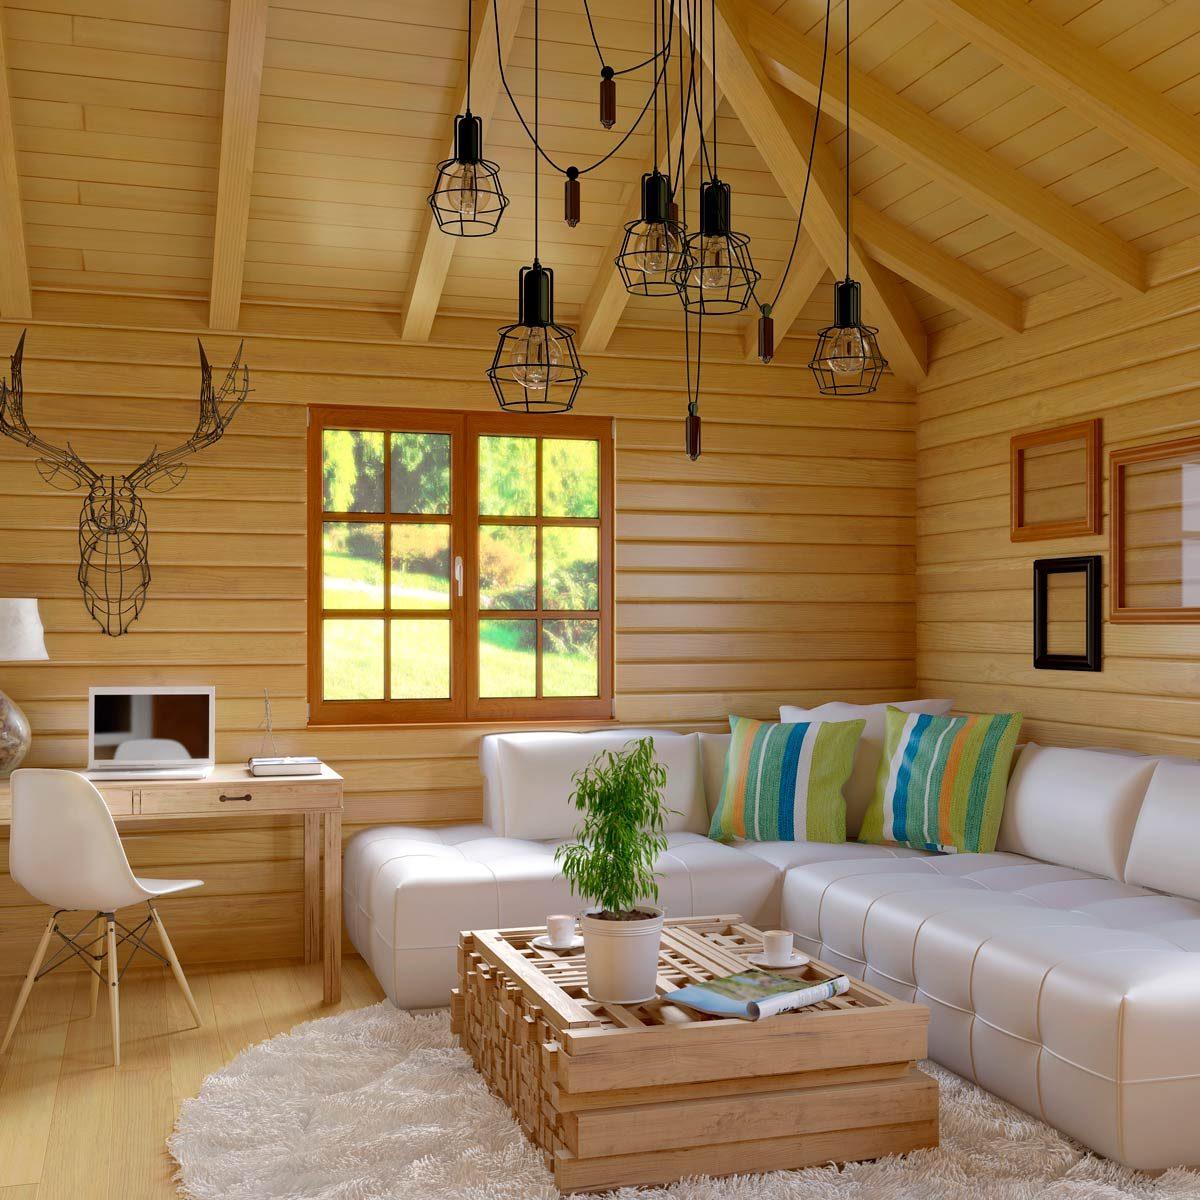 Rustic Living Rooms: Rustic Living Room Ideas We Love